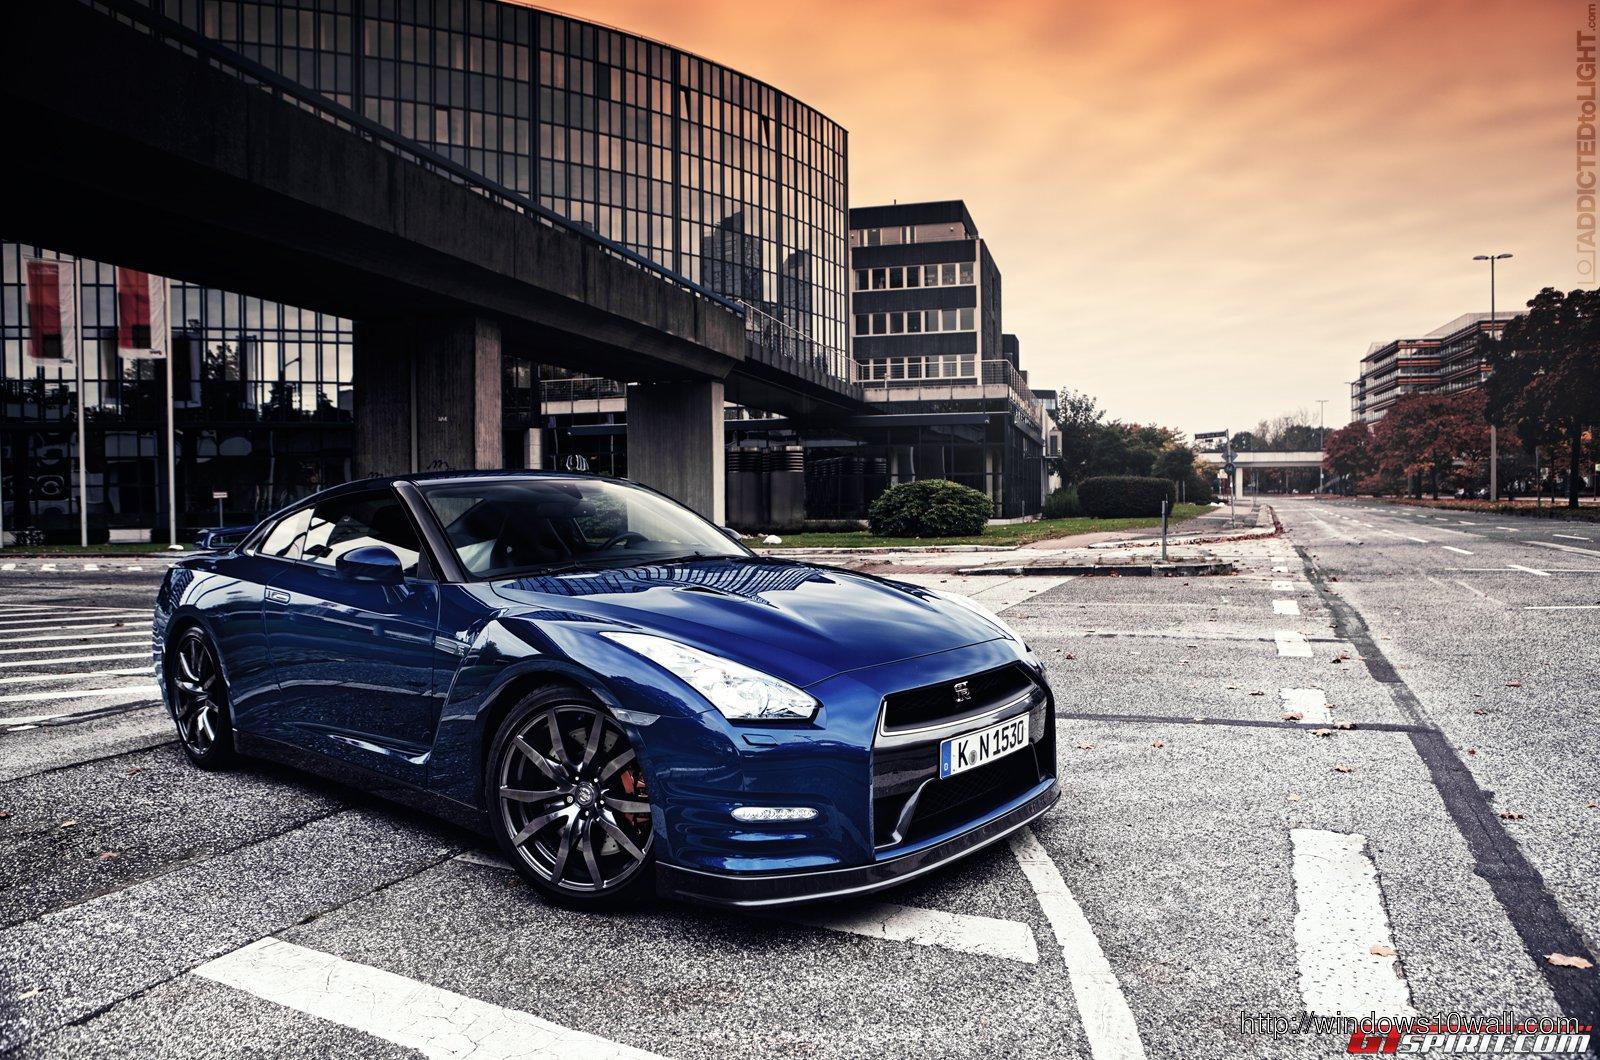 Nissan GTR 2013 Desktop Background Wallpaper